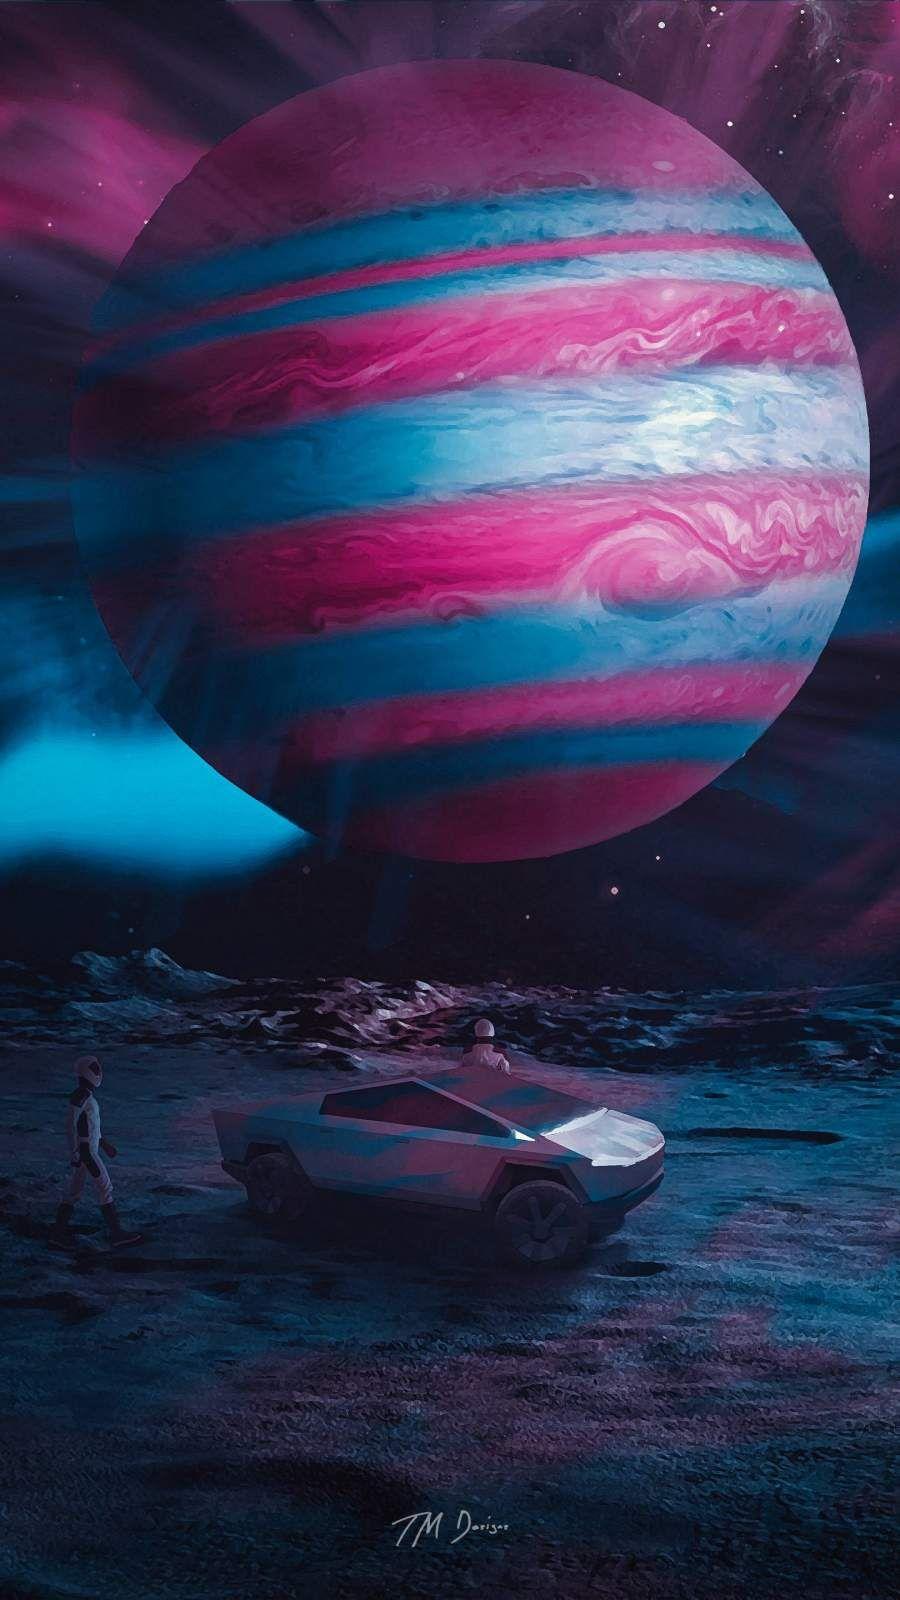 Tesla Cybertruck On Jupiter Iphone Wallpaper In 2020 Iphone